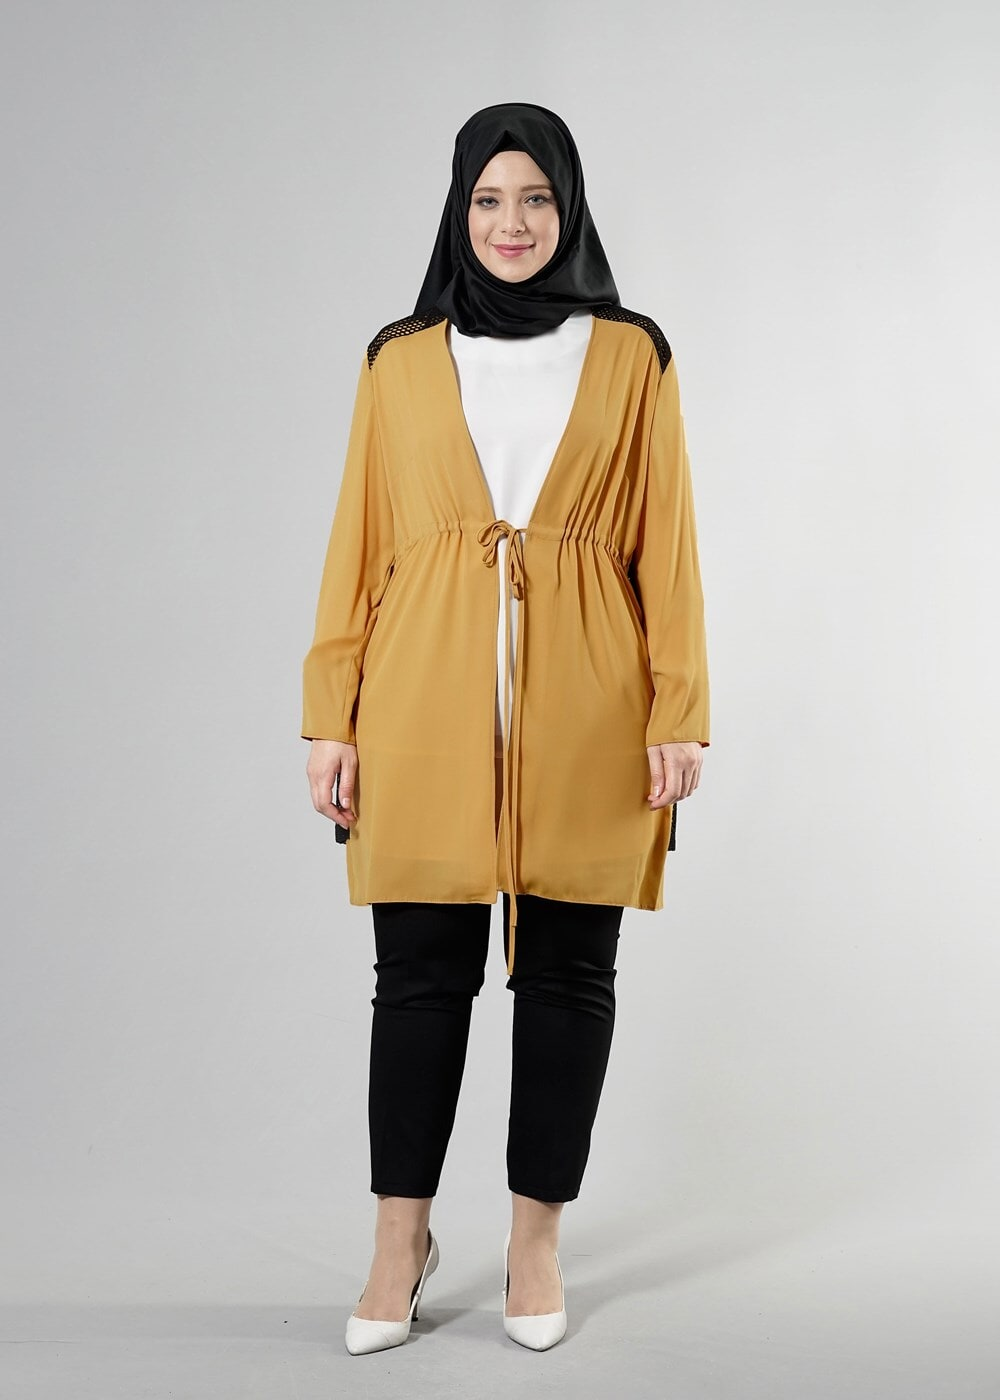 Female YELLOW T 2516 Port  Crep  Düz Tesettür Ceket-Alv Fashion